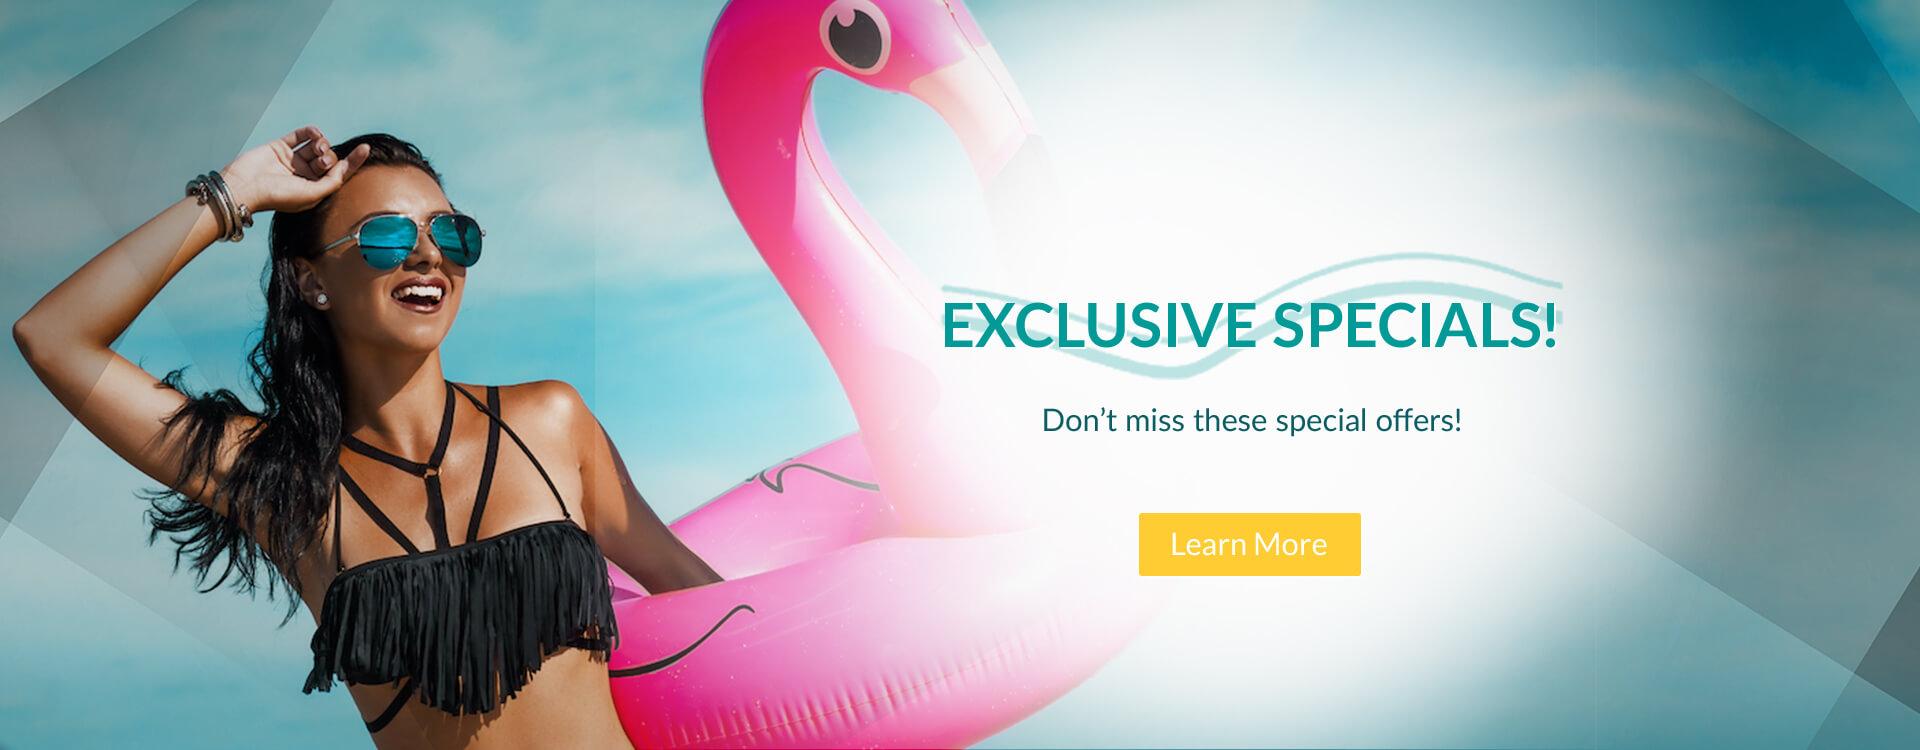 exclusive-specials-1